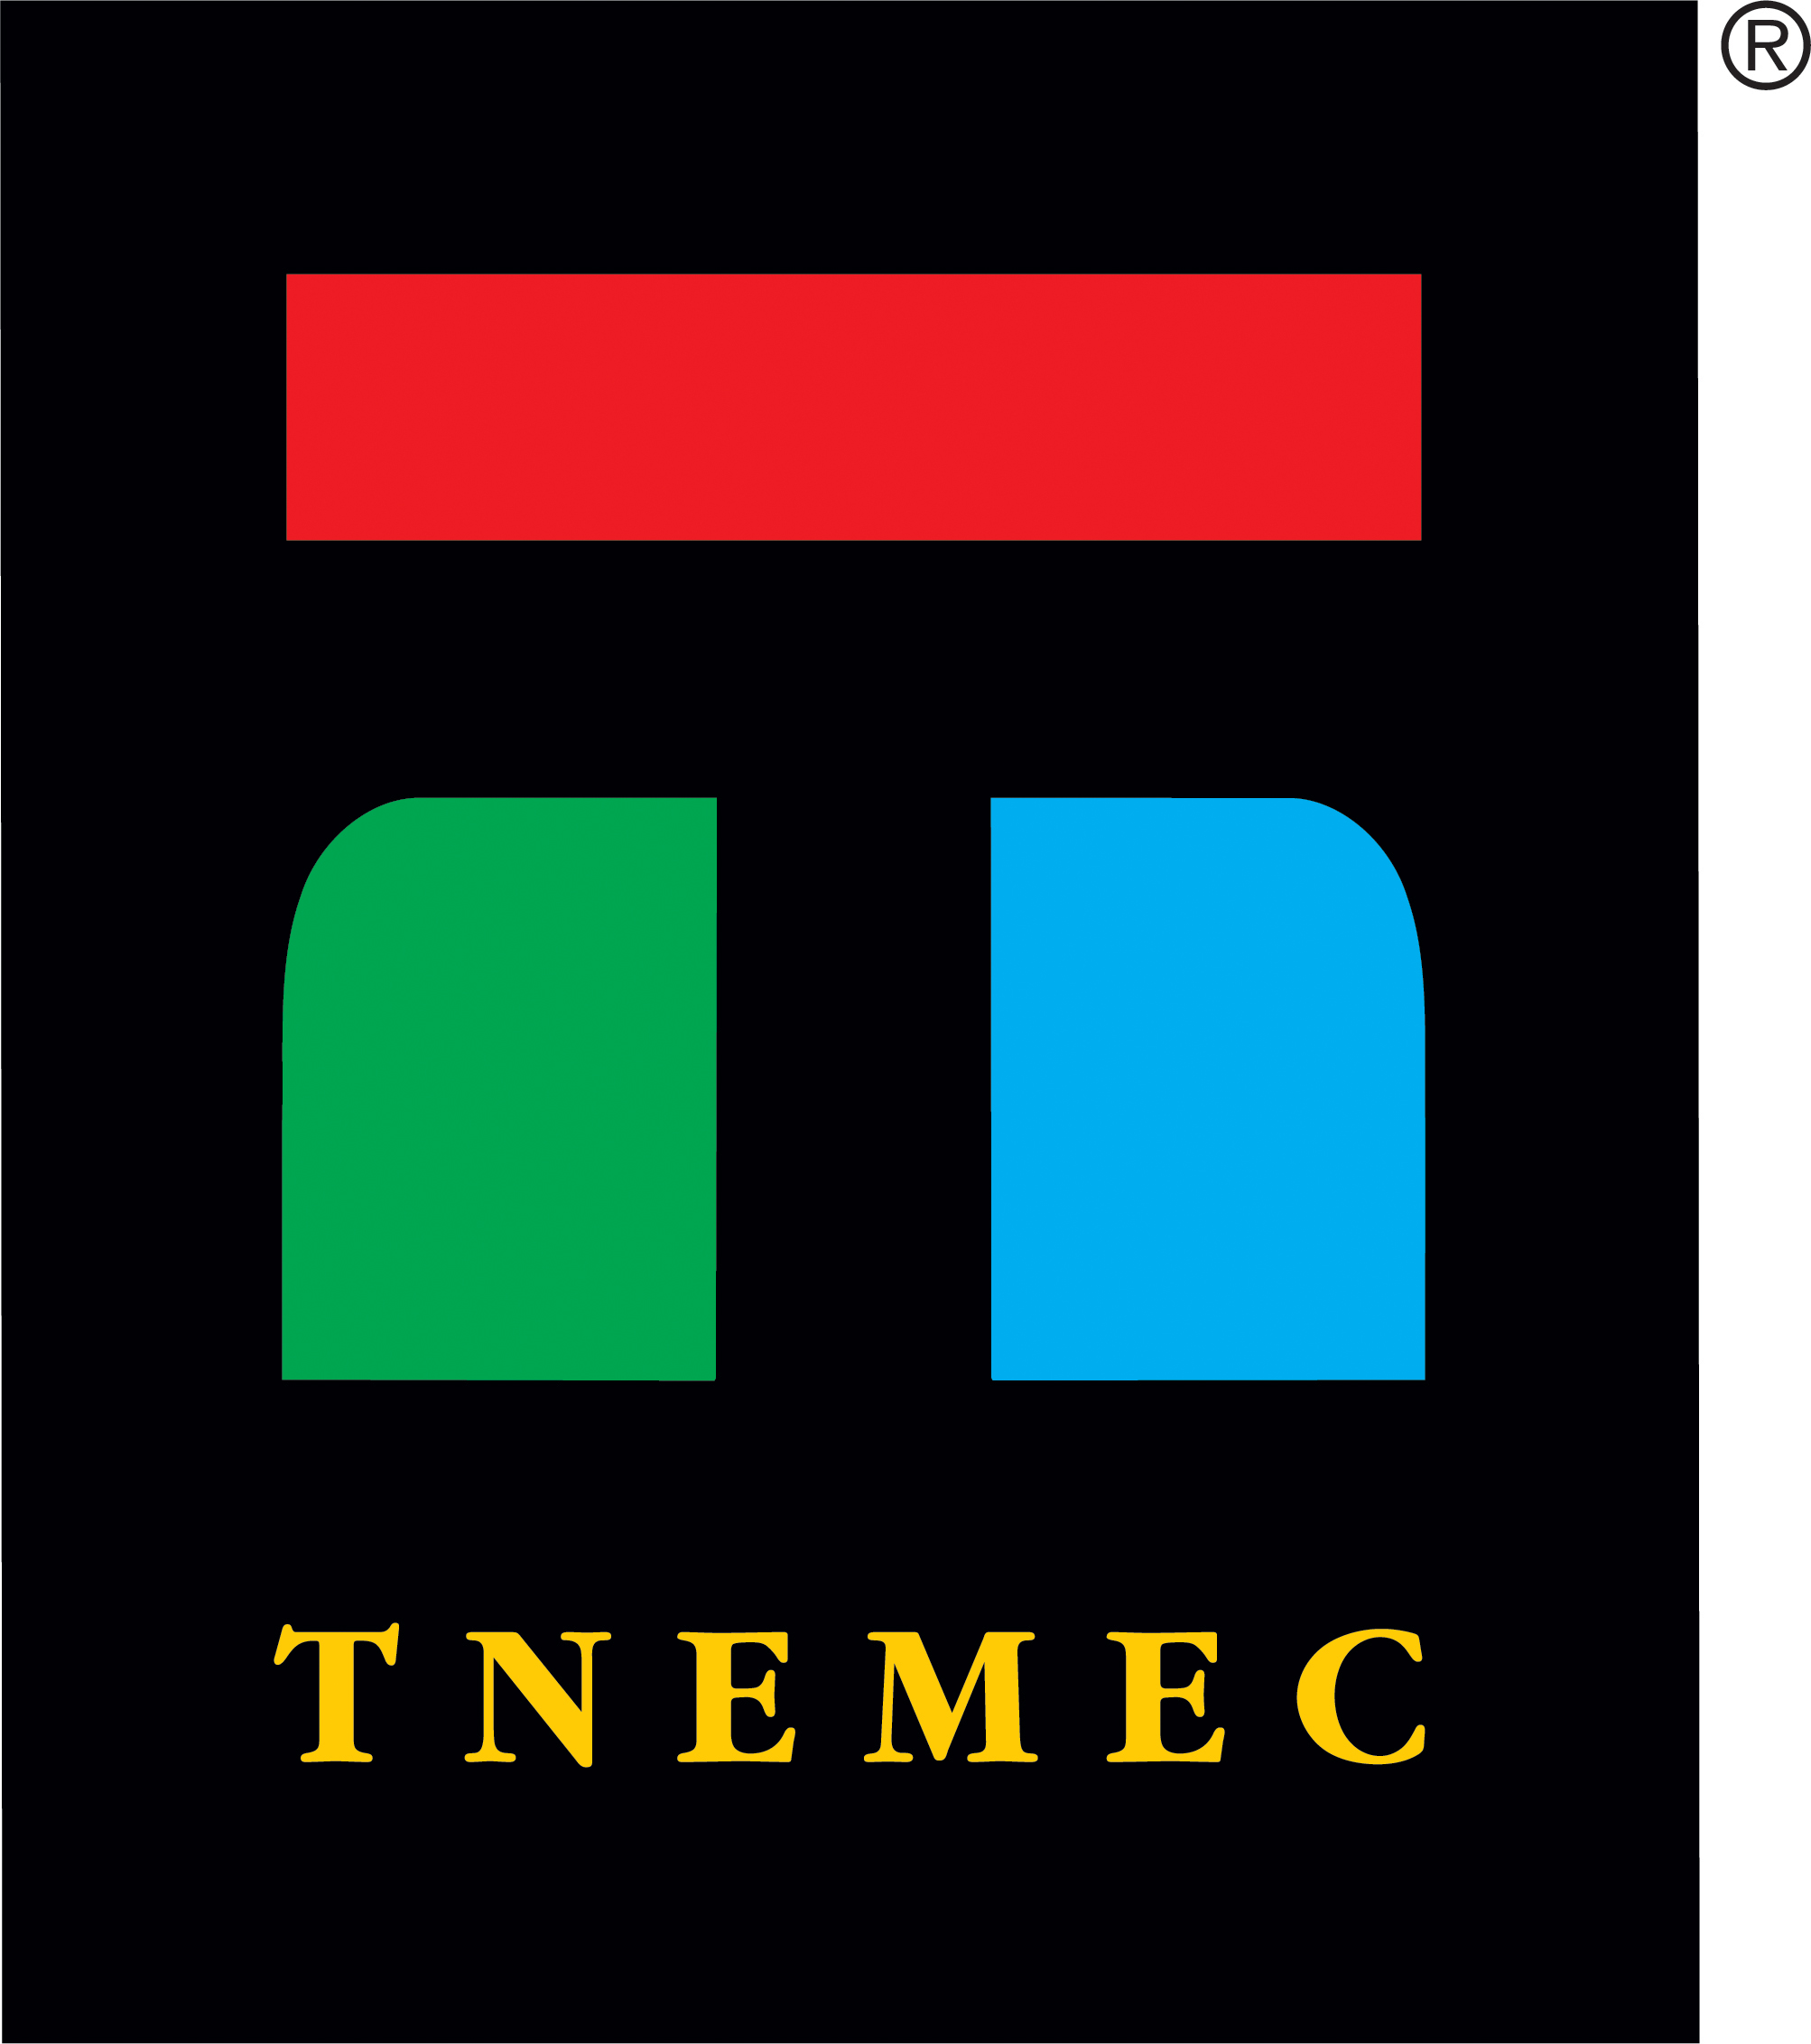 Tnemec_Light Backgrounds_RGB.JPG